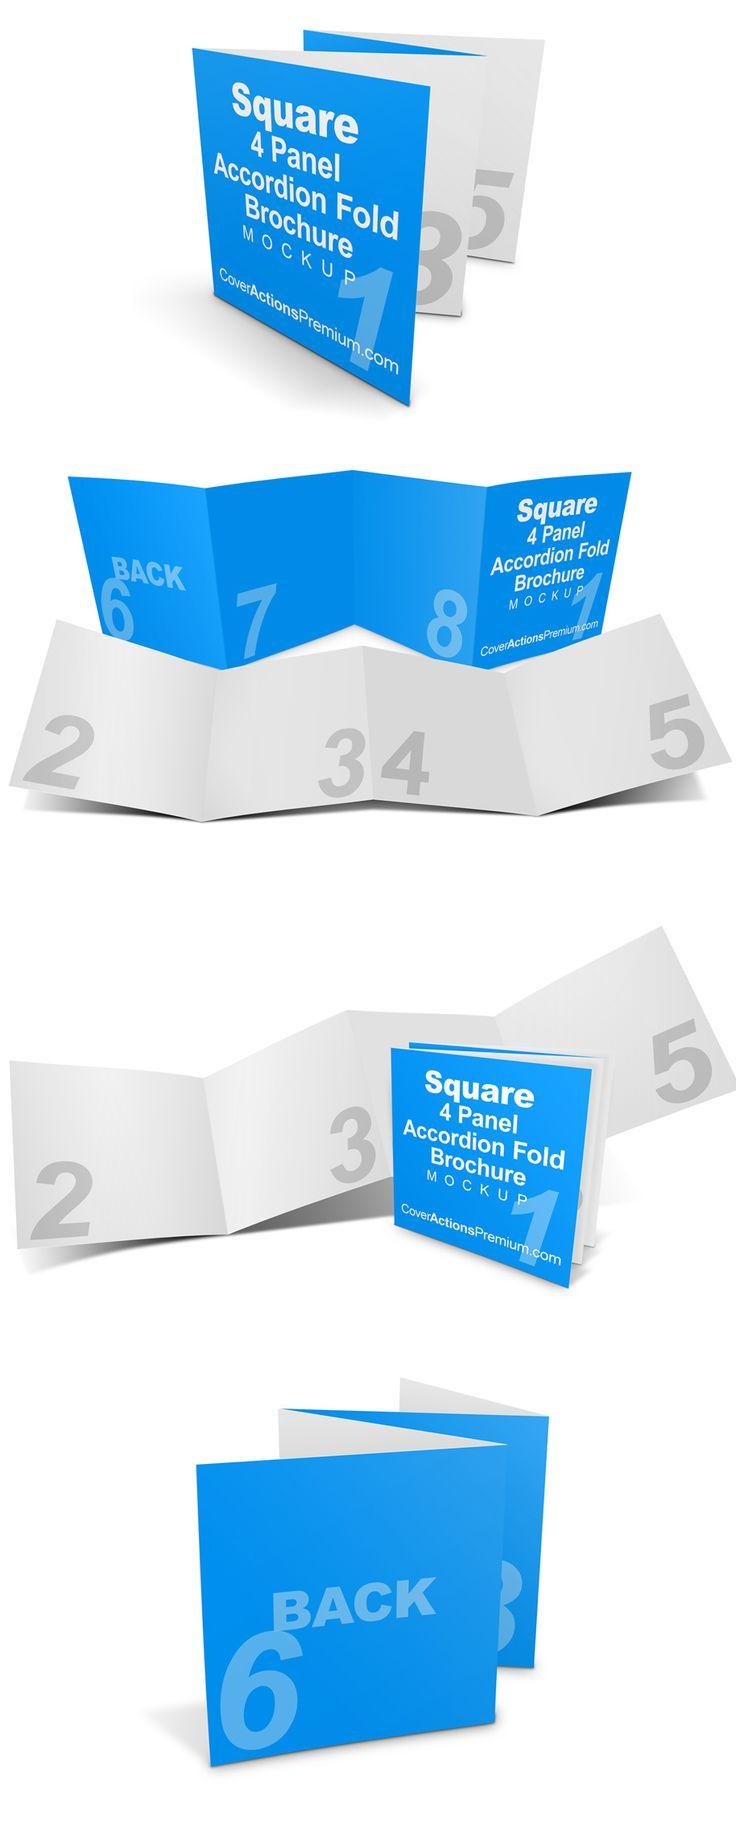 Square 4 Fold Brochure Mockup - Accordion